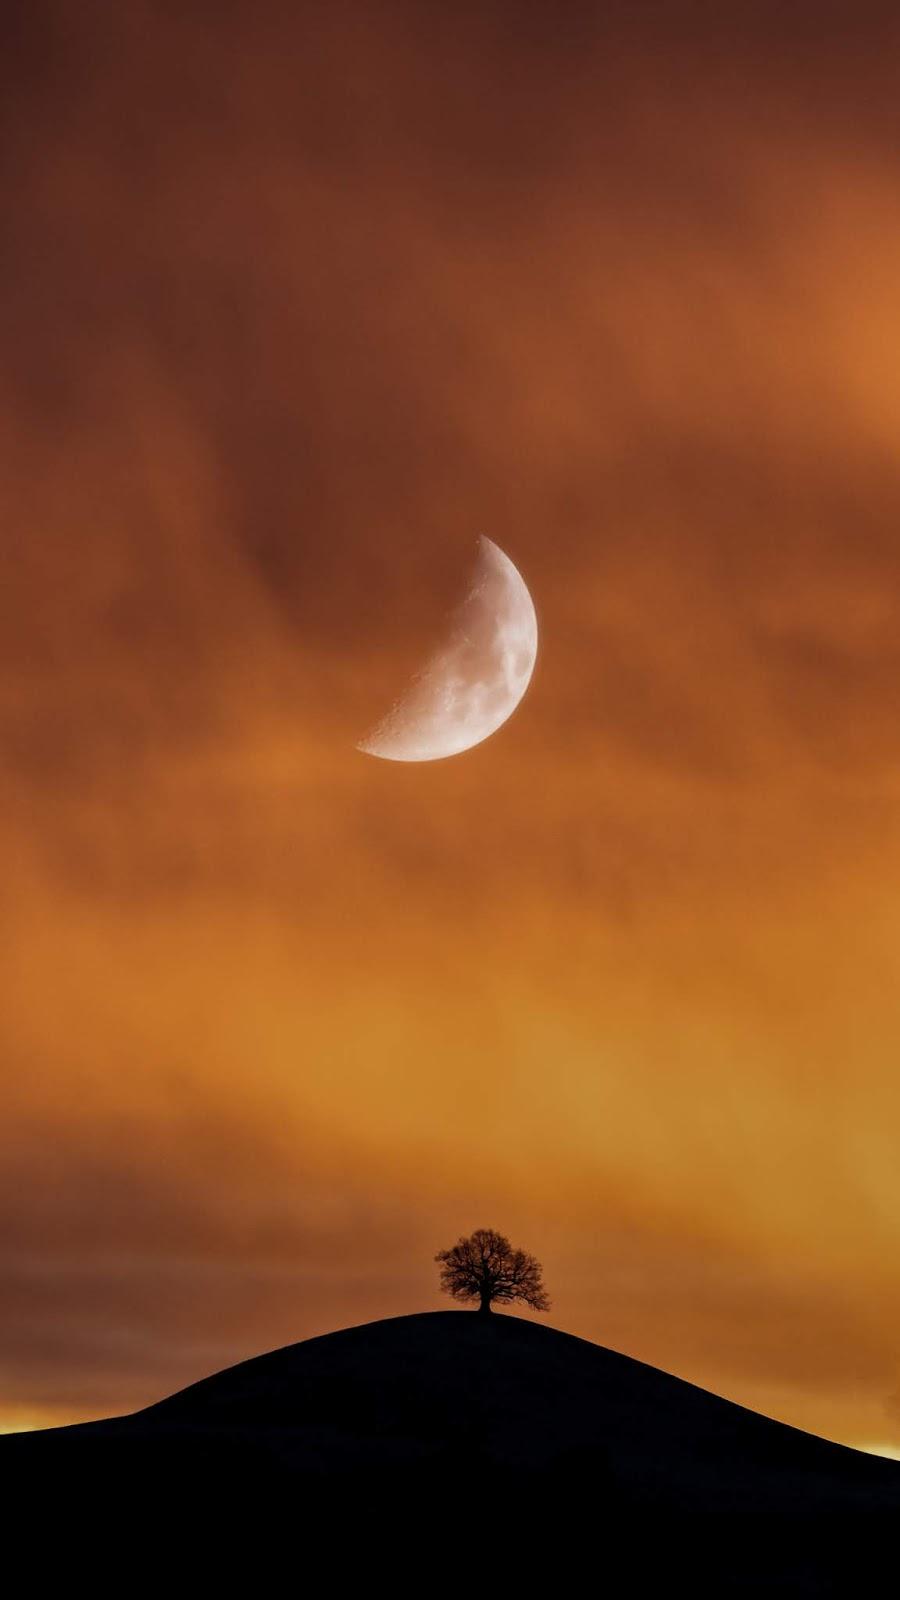 Lonely tree under half moon